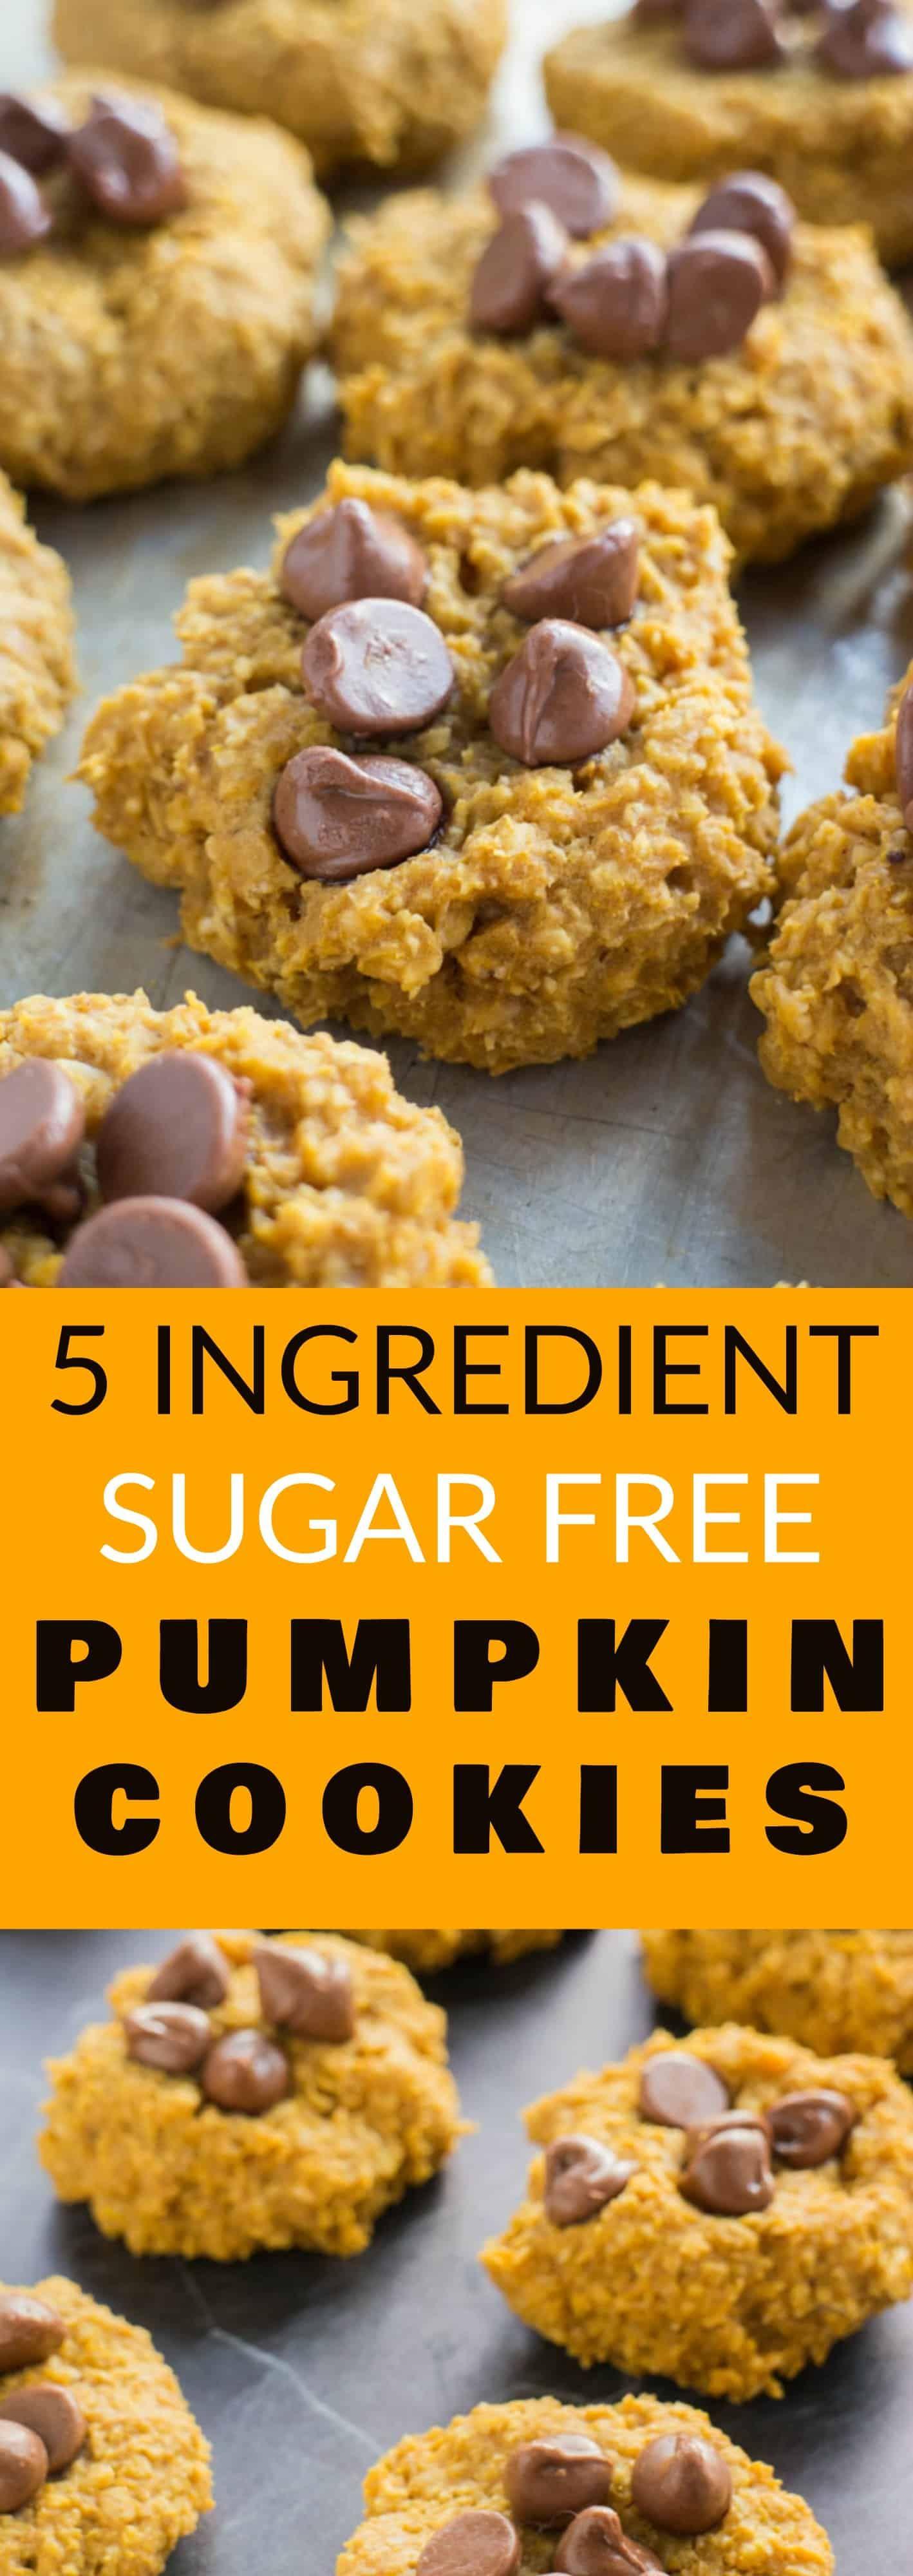 5 Ingredient Healthy Pumpkin Cookies images